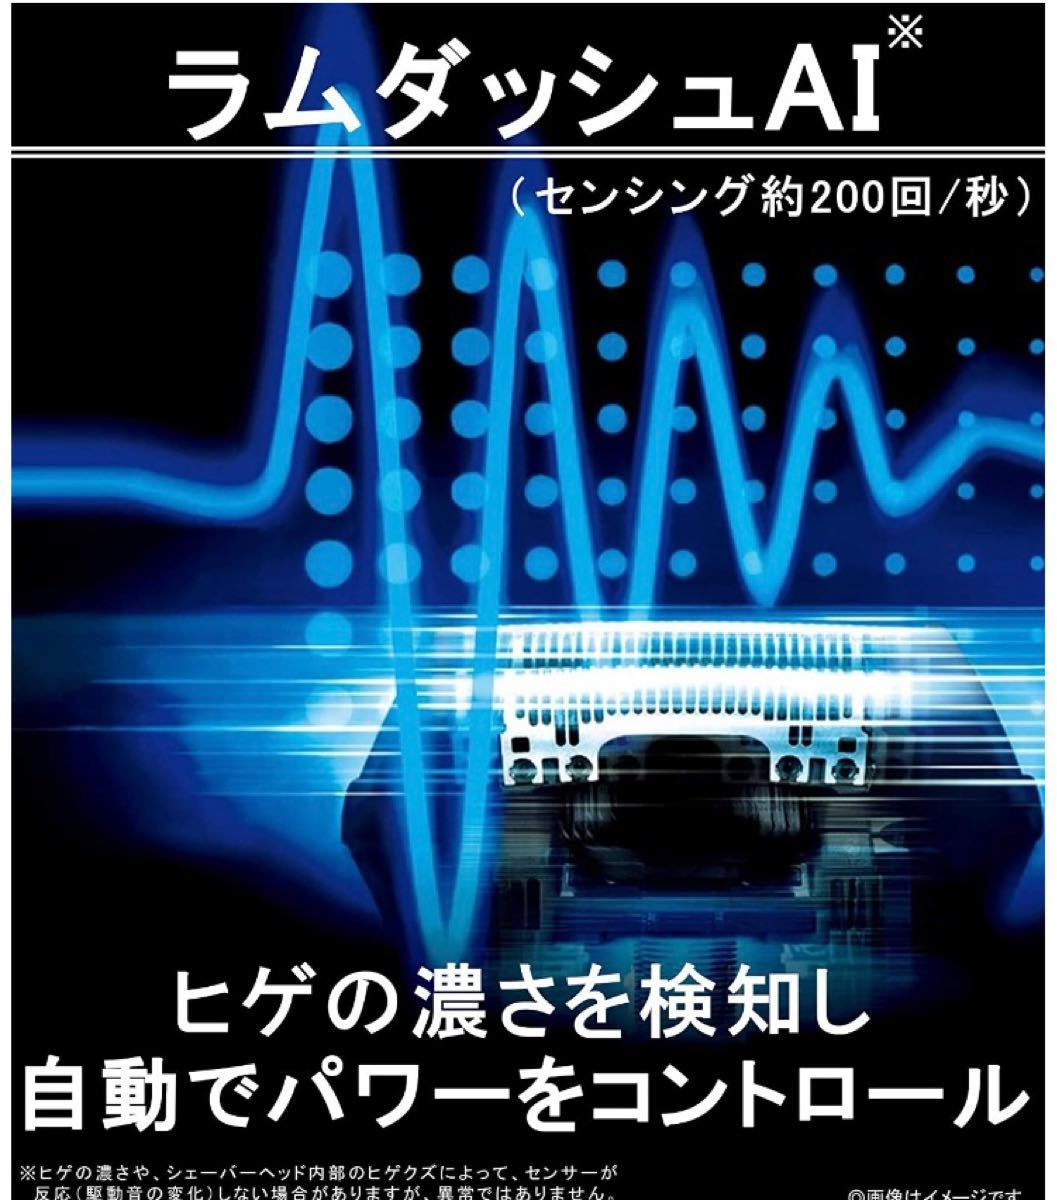 Panasonic パナソニック ES-CST2S-K(黒) メンズシェーバー 5枚刃 ラムダッシュ